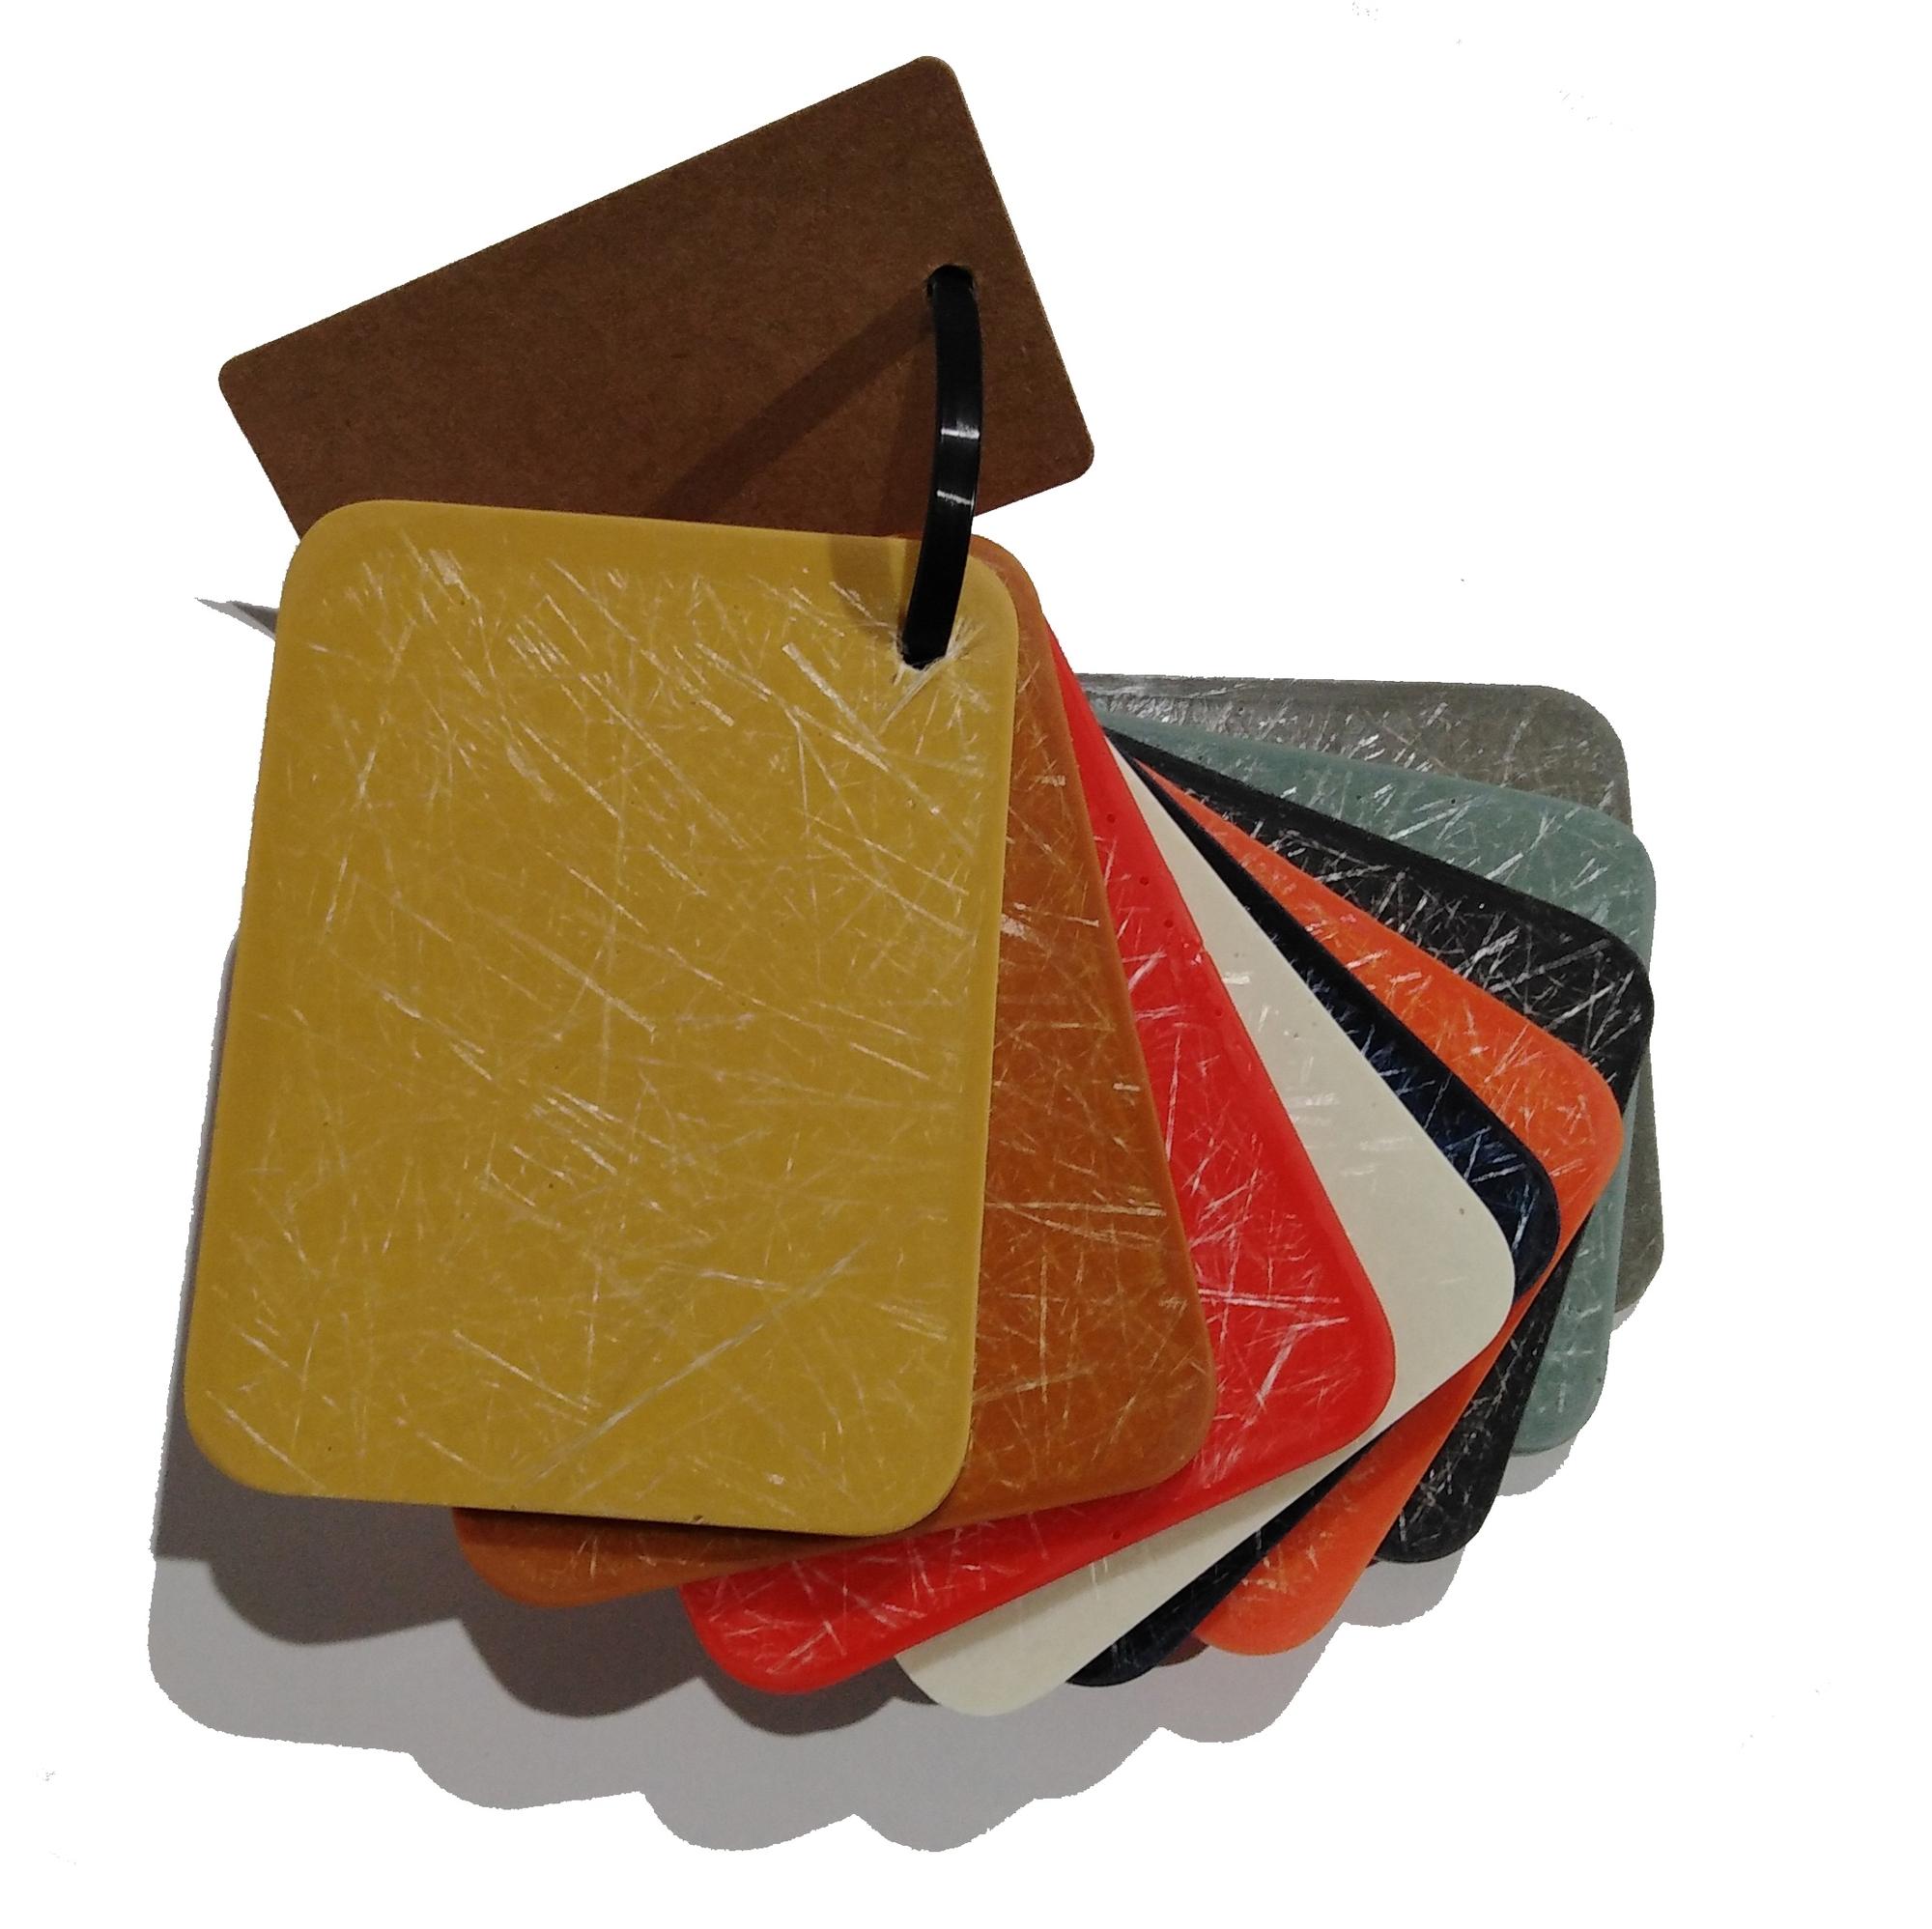 Kunststoffmuster für Eames Fiberglas Chairs Vitra